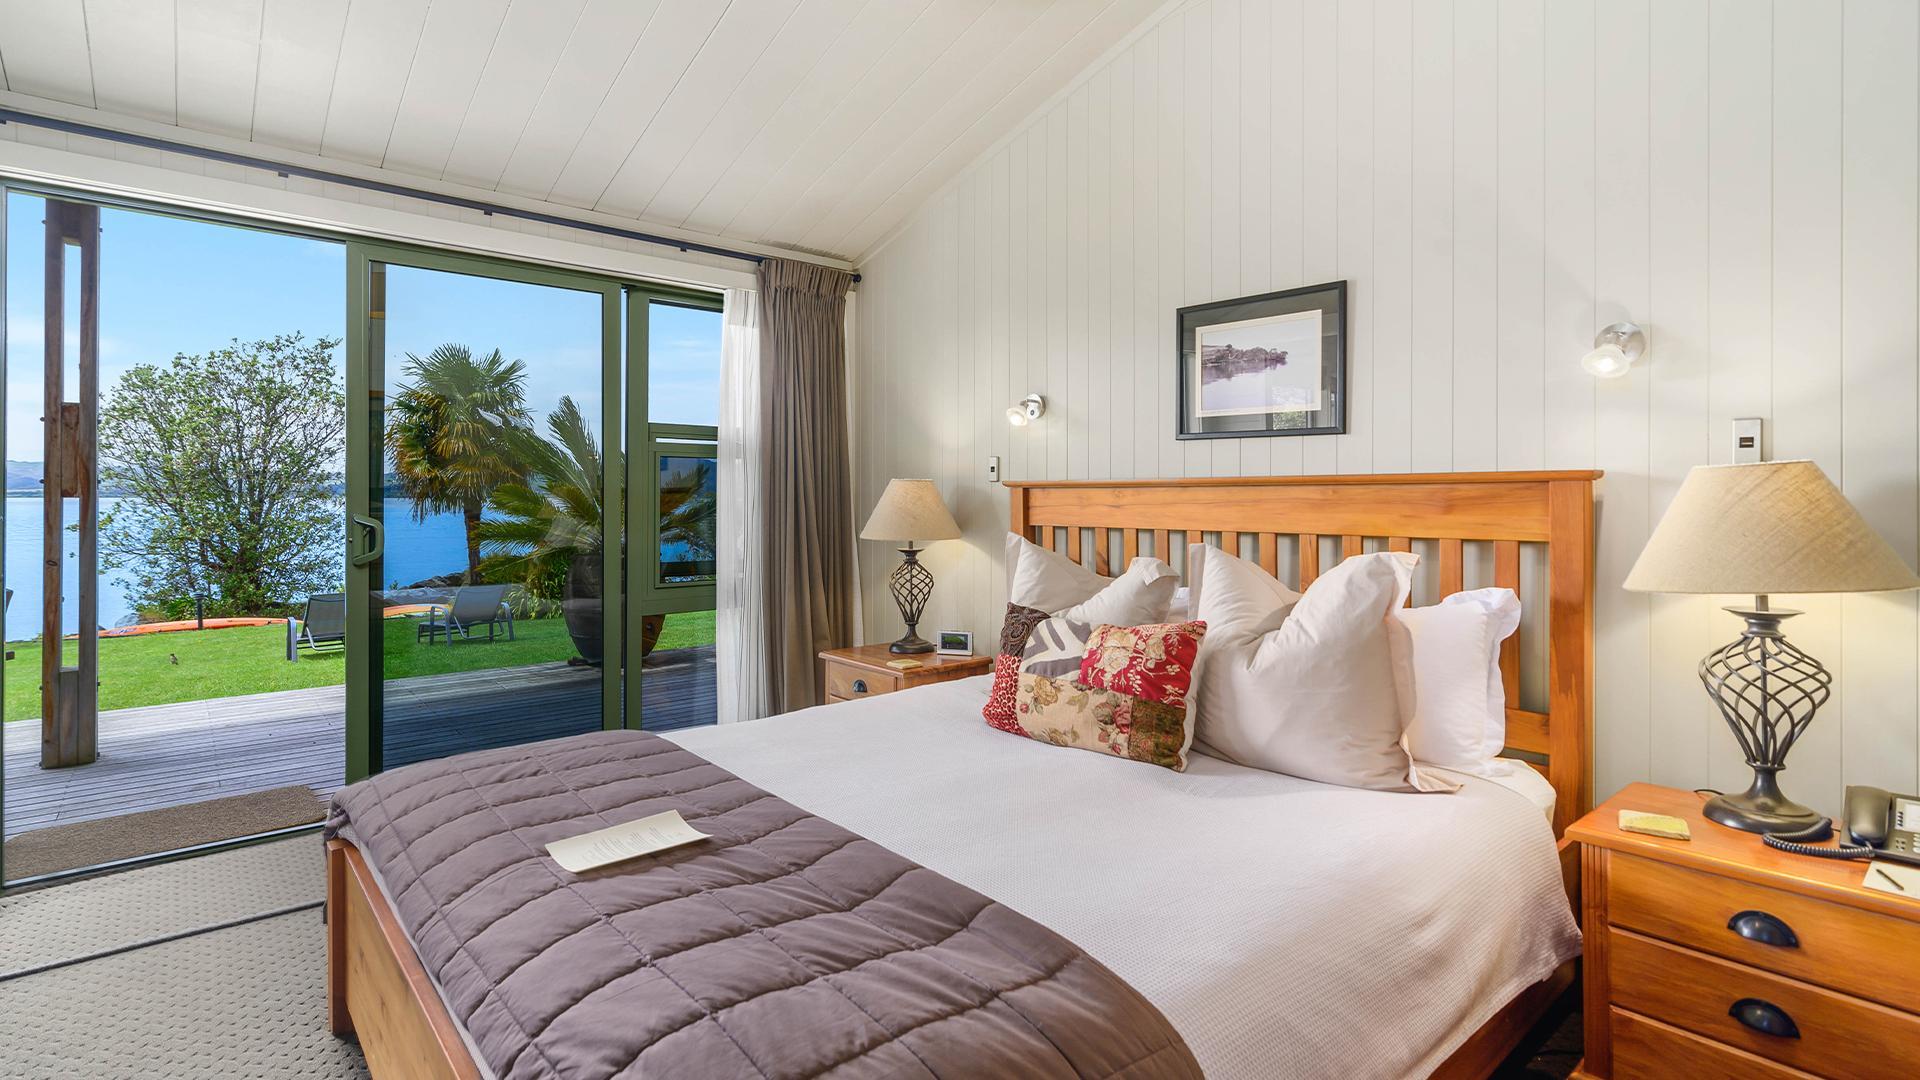 Lodge Room image 1 at Koura Lodge by null, Bay of Plenty, New Zealand